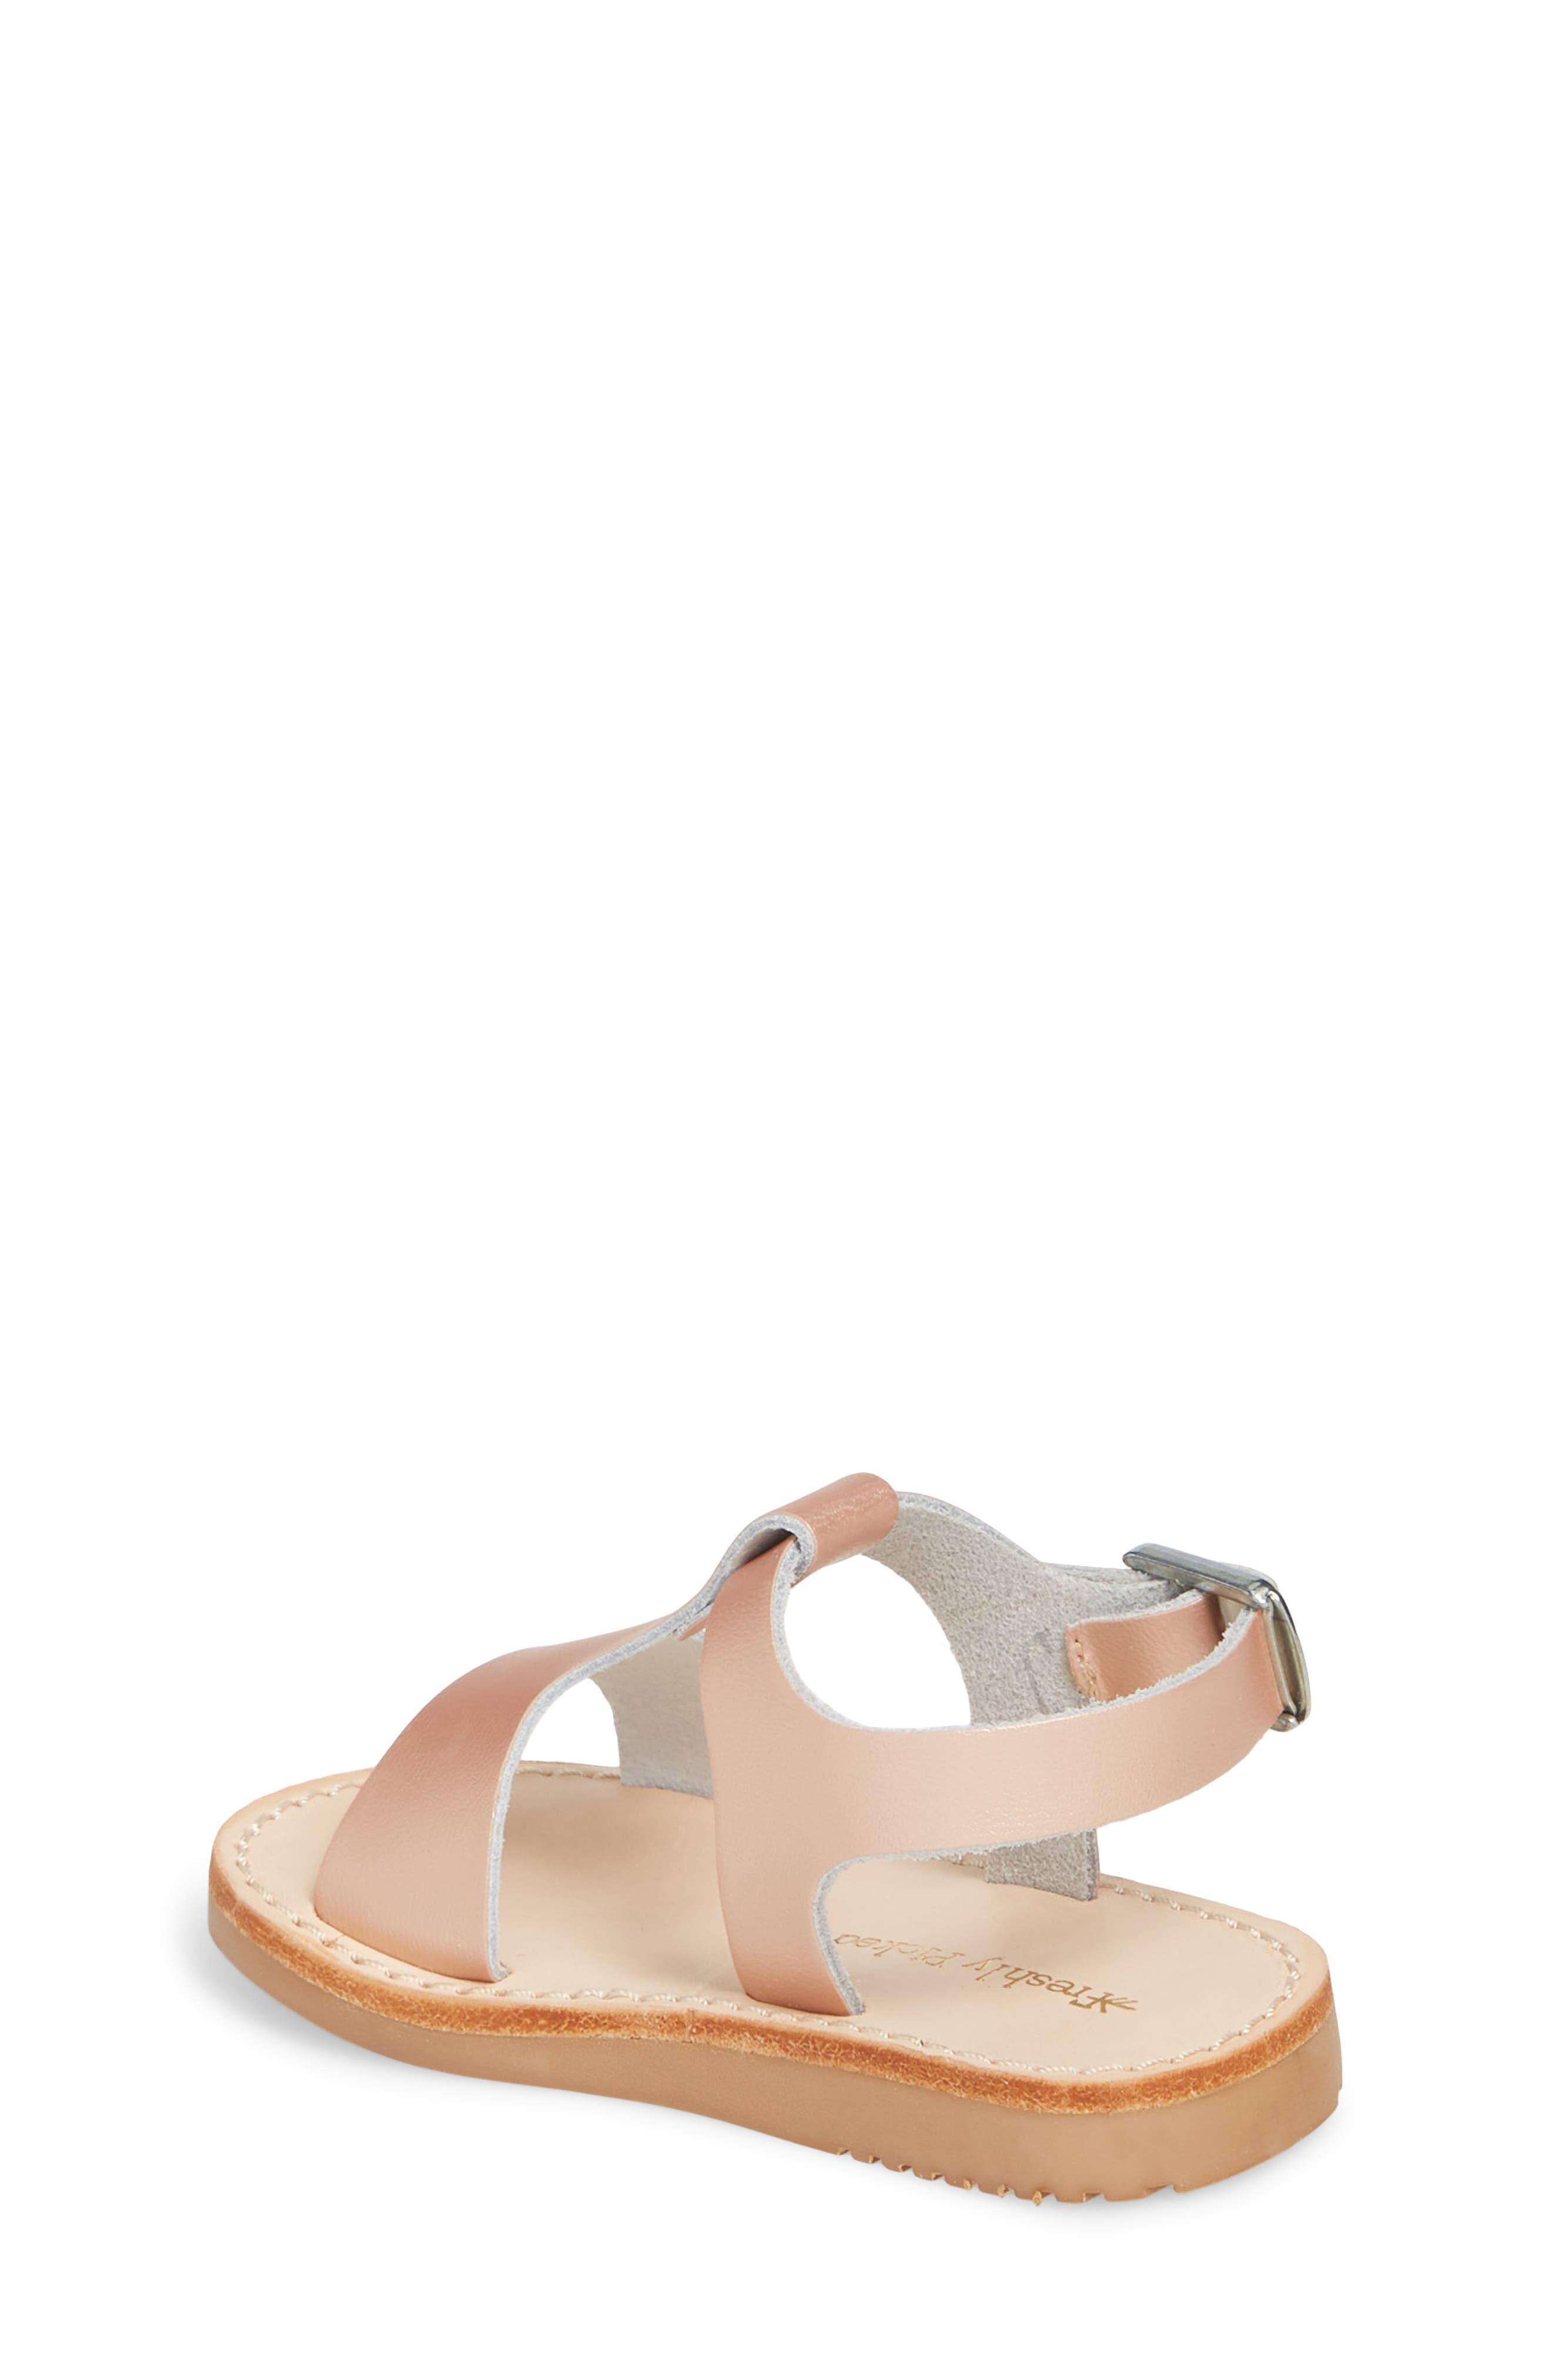 Malibu Water Resistant Sandal,                             Alternate thumbnail 2, color,                             ROSE GOLD